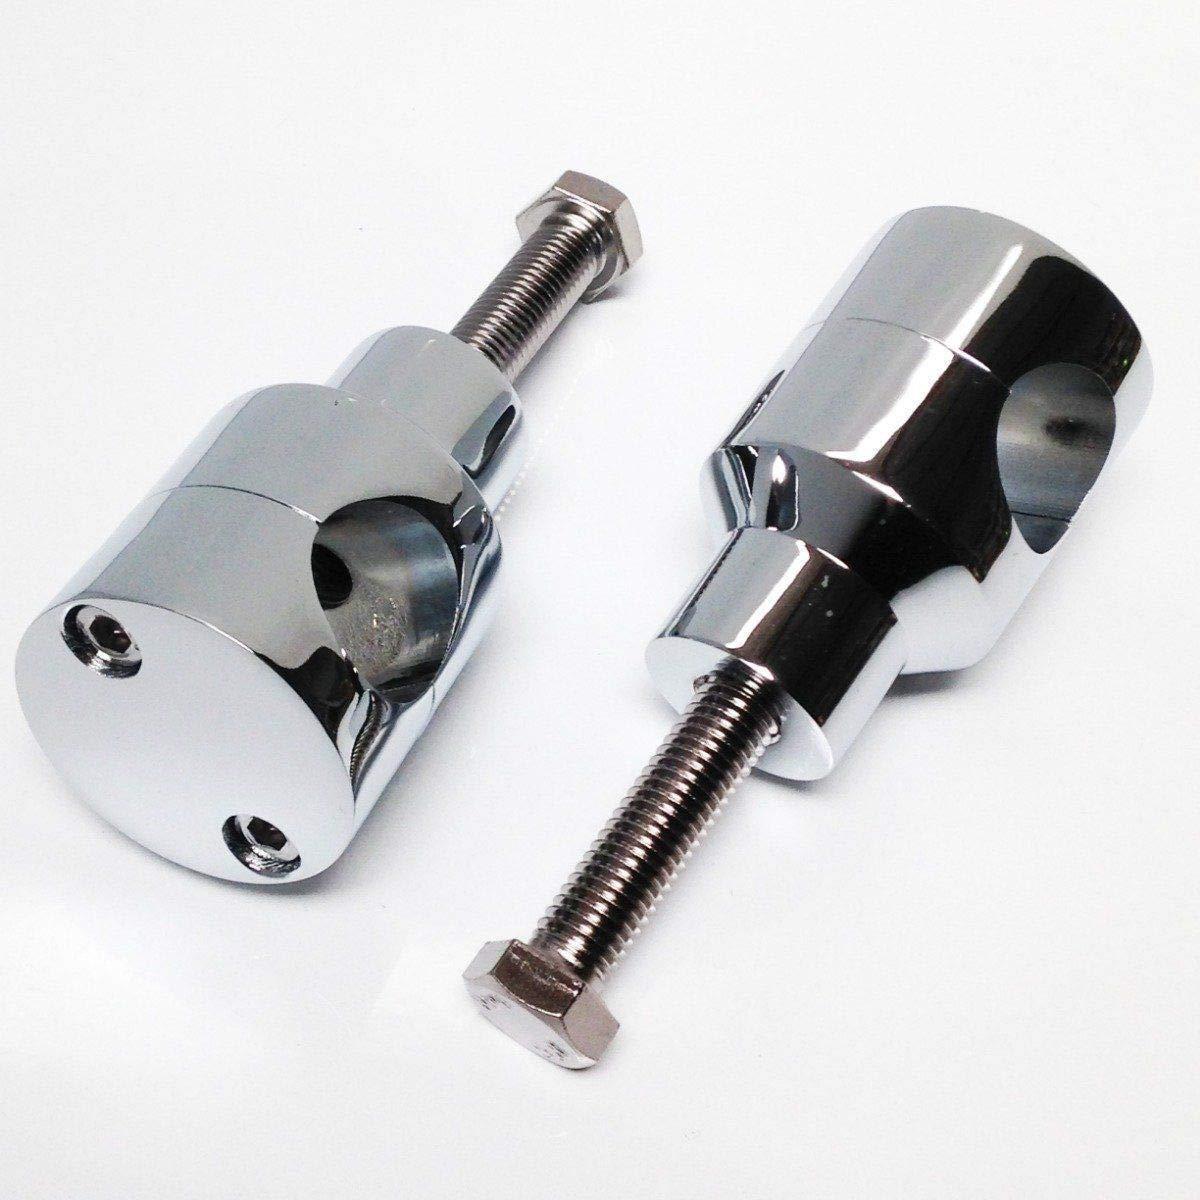 per Accessori Auto BEESCLOVER 7//8 22 mm 1 25 mm Manubrio Riser per Custom Springer Bobber Chopper Nero 25 mm